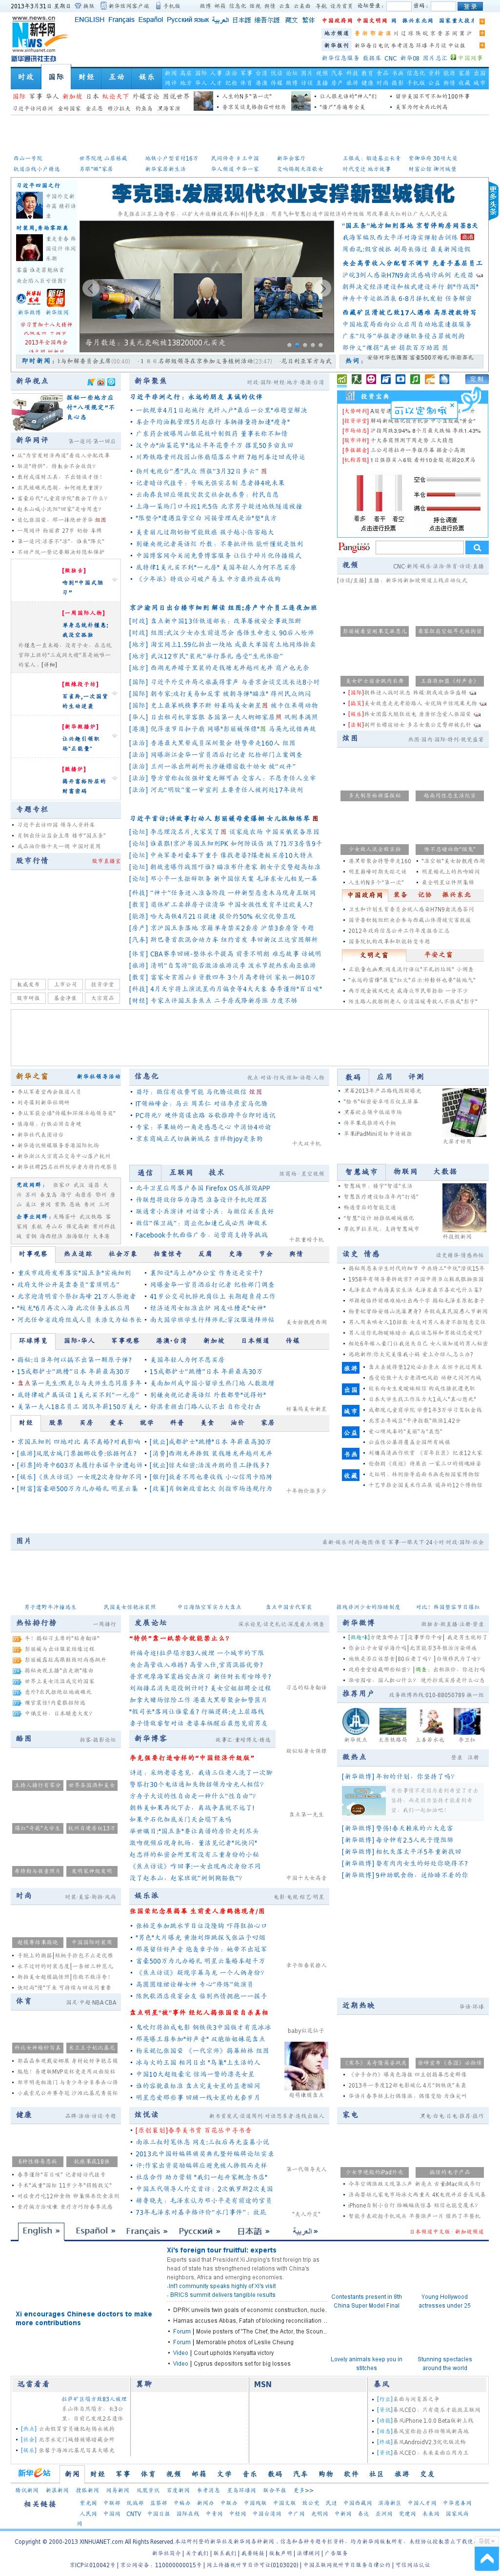 Xinhua at Sunday March 31, 2013, 7:44 p.m. UTC